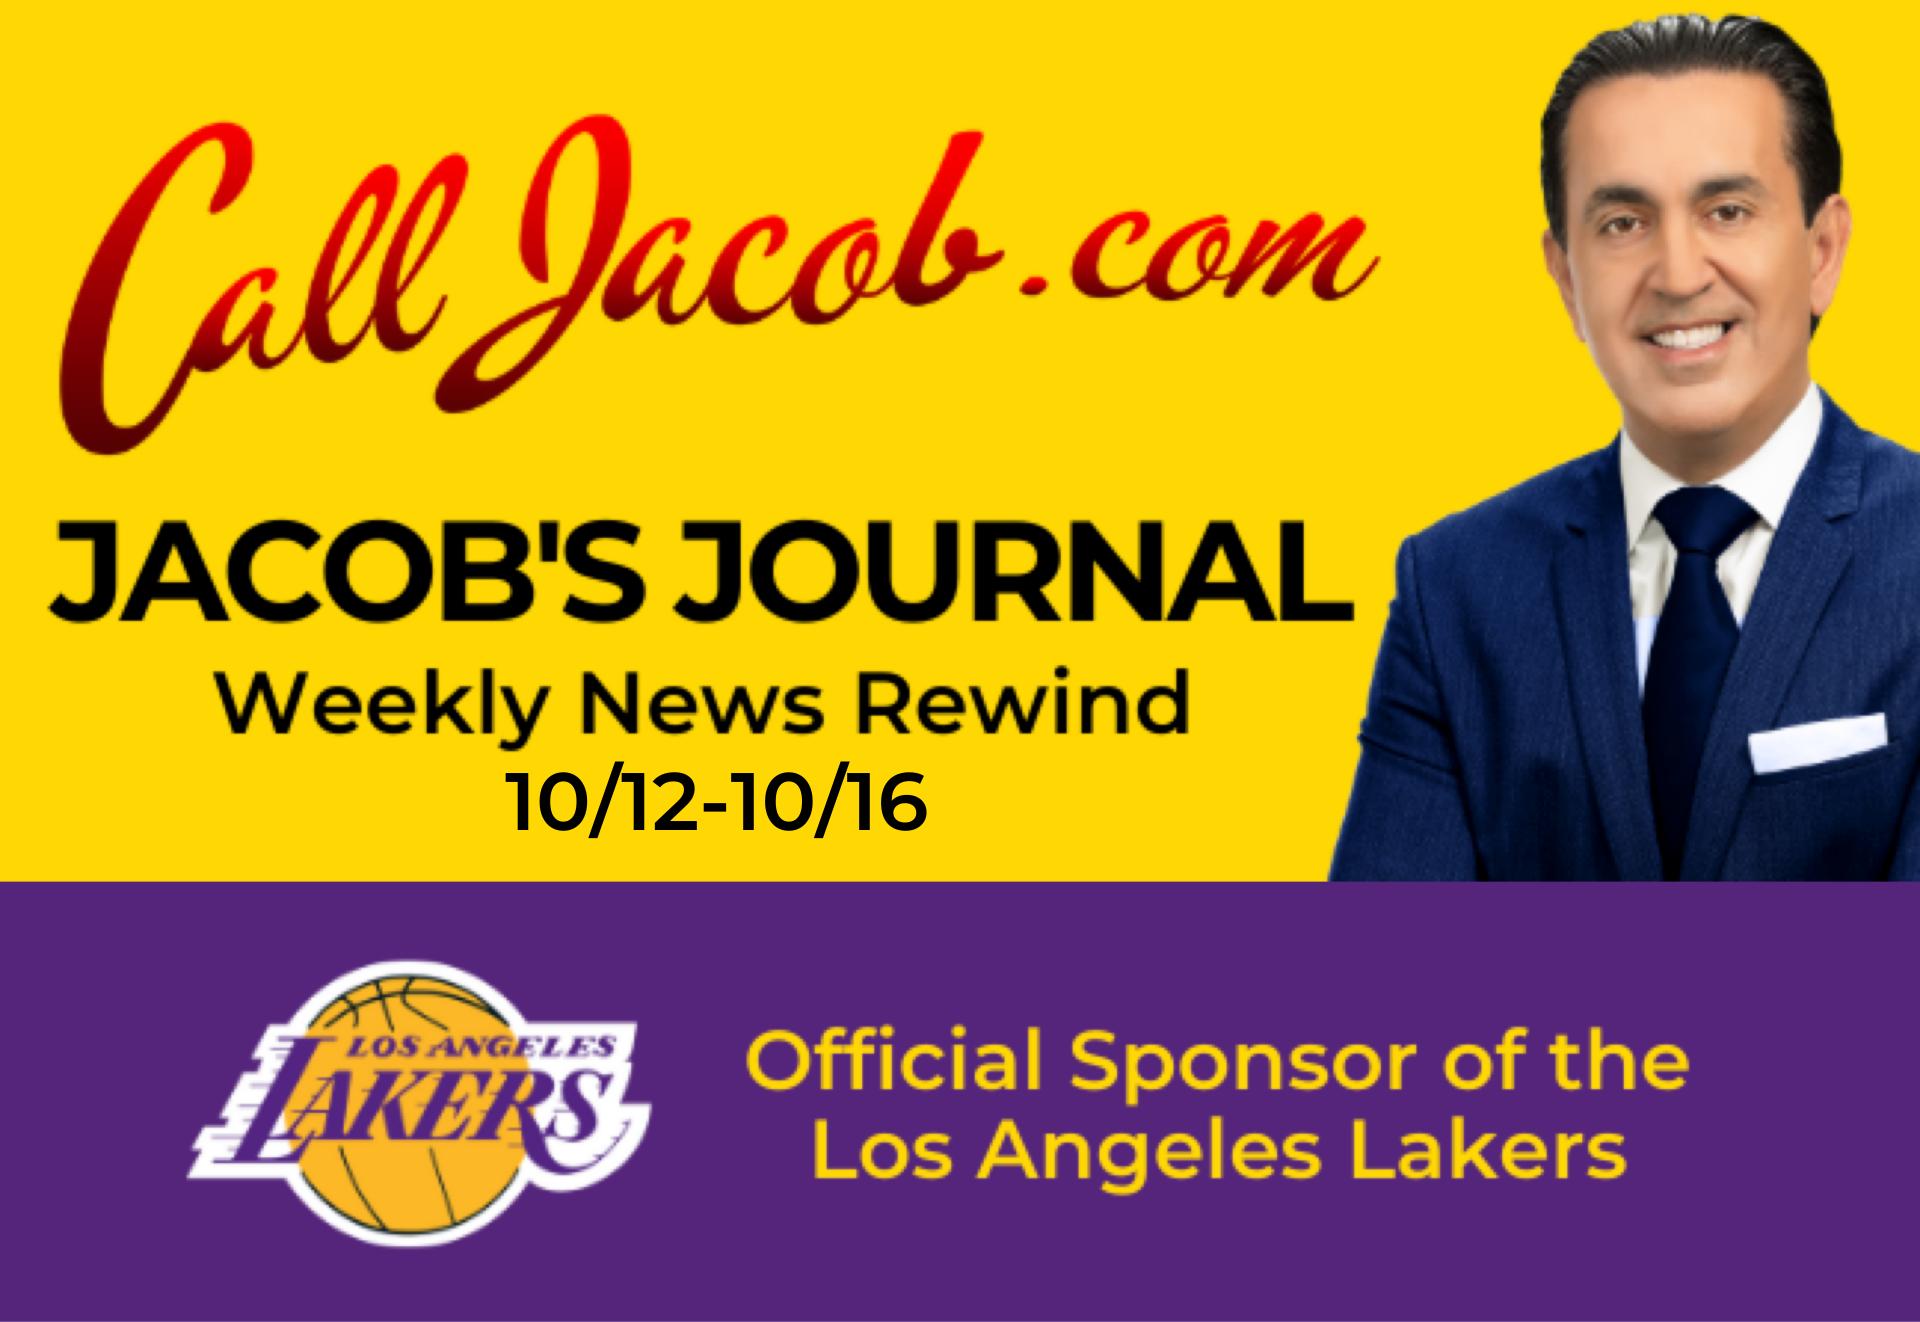 JacobsJournalWeeklyNewsRewind-10-12_10-16